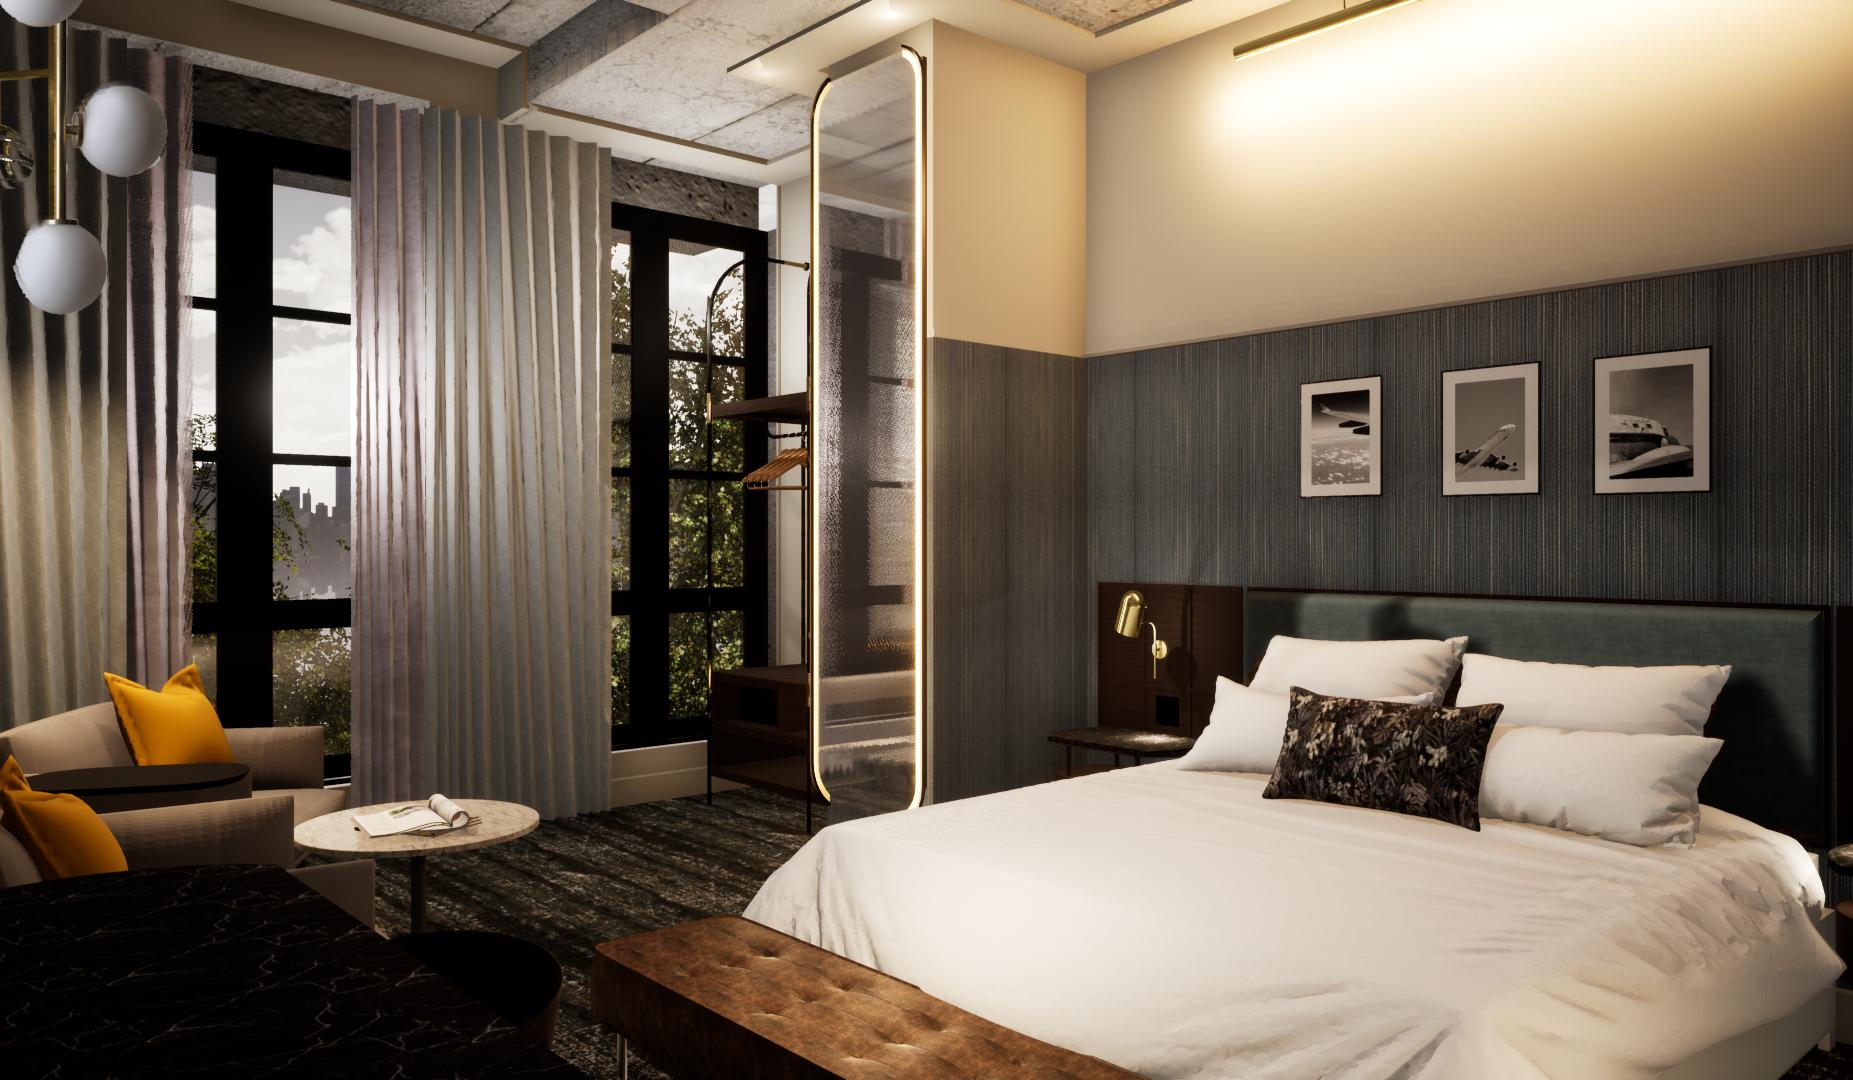 imbewu-design-the-bank-hotel-render-01